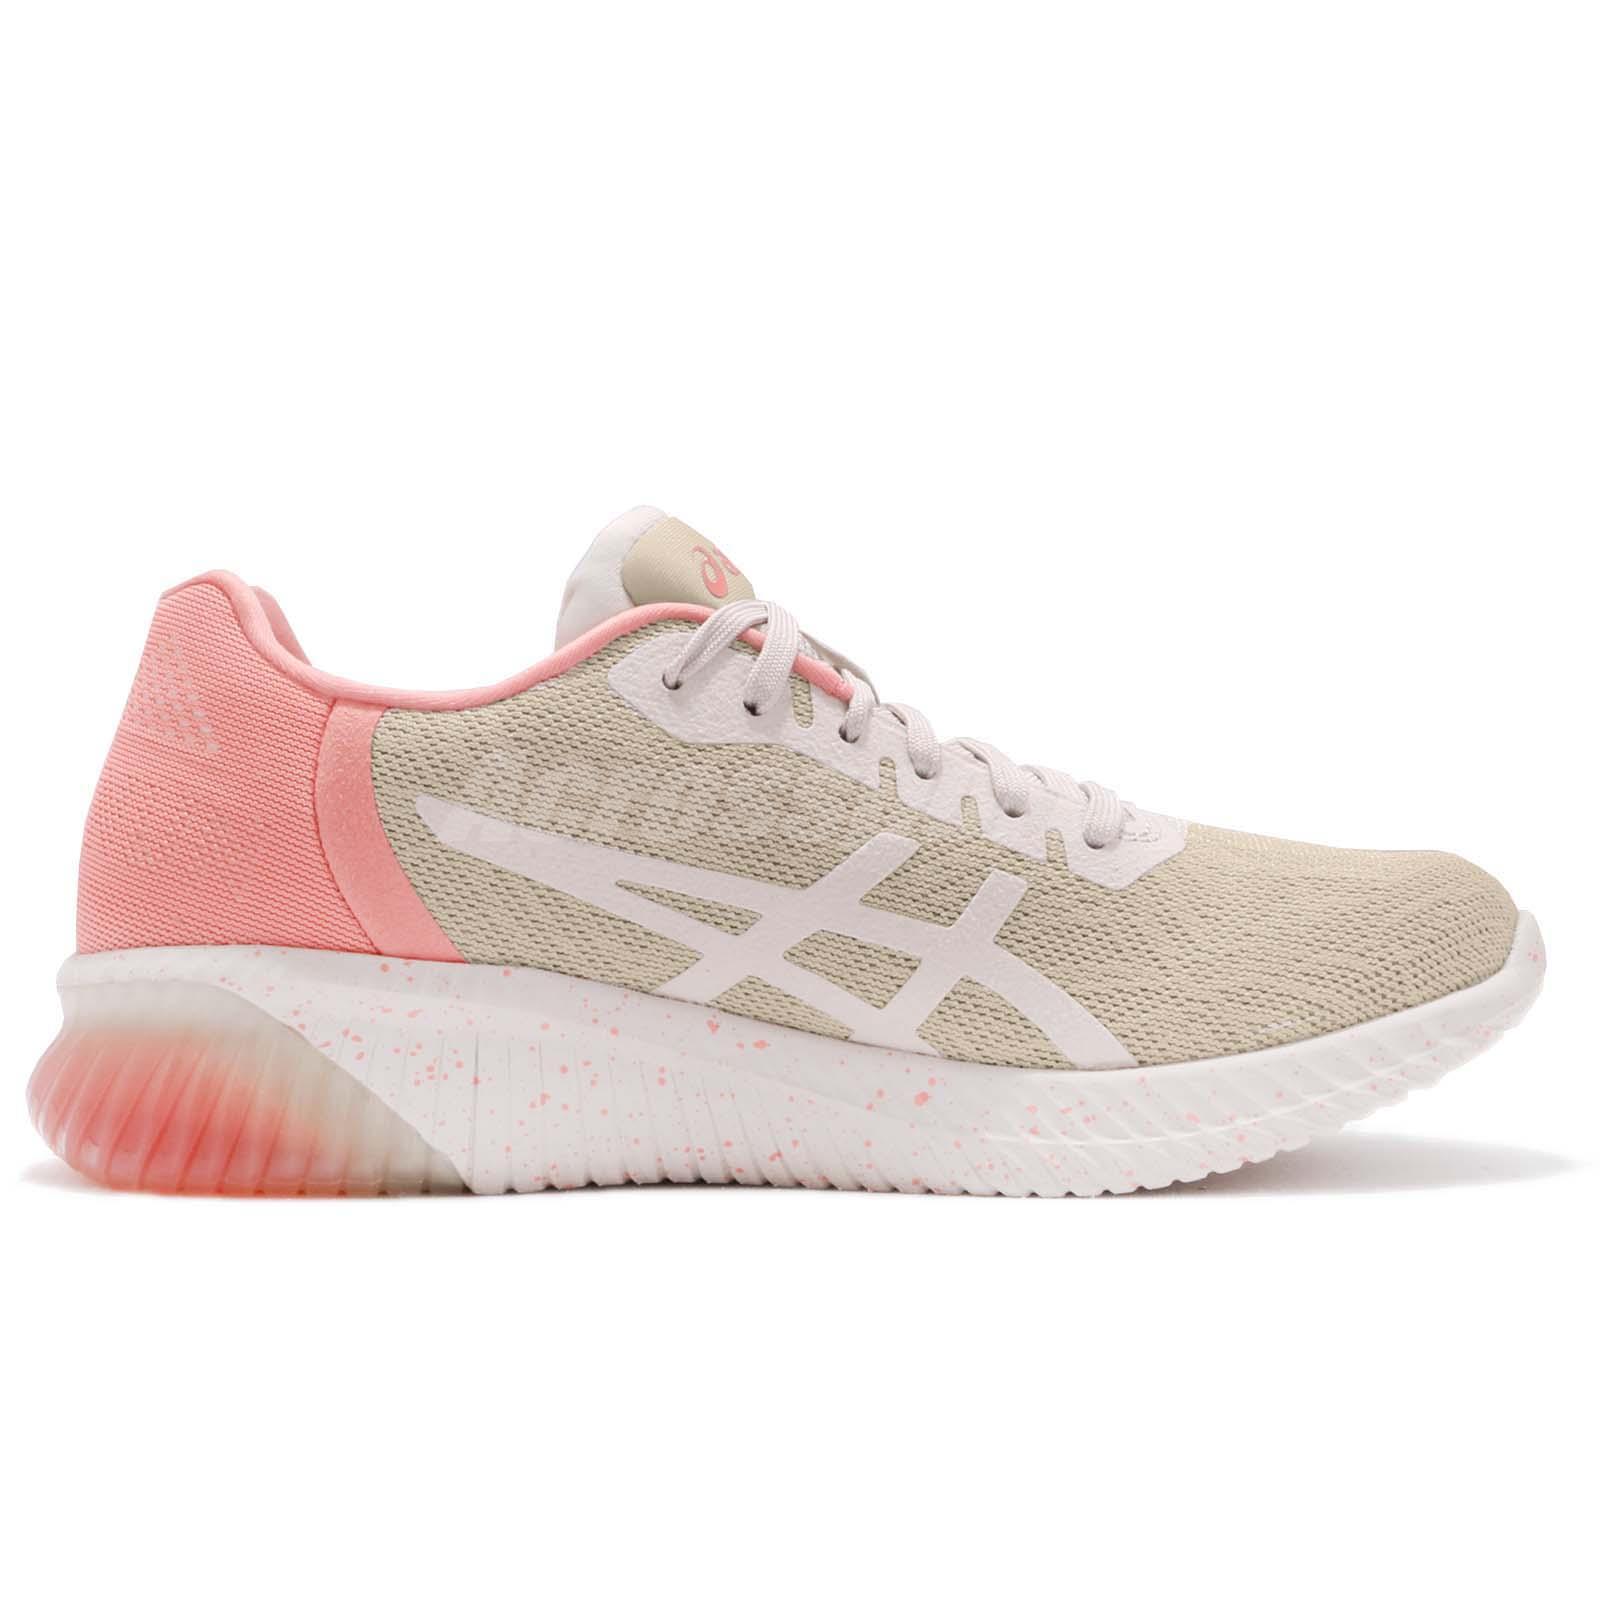 5b306b26ea25 Asics Gel-Kenun SP SAKURA Cherry Pink Blossom Women Gear Easy ...